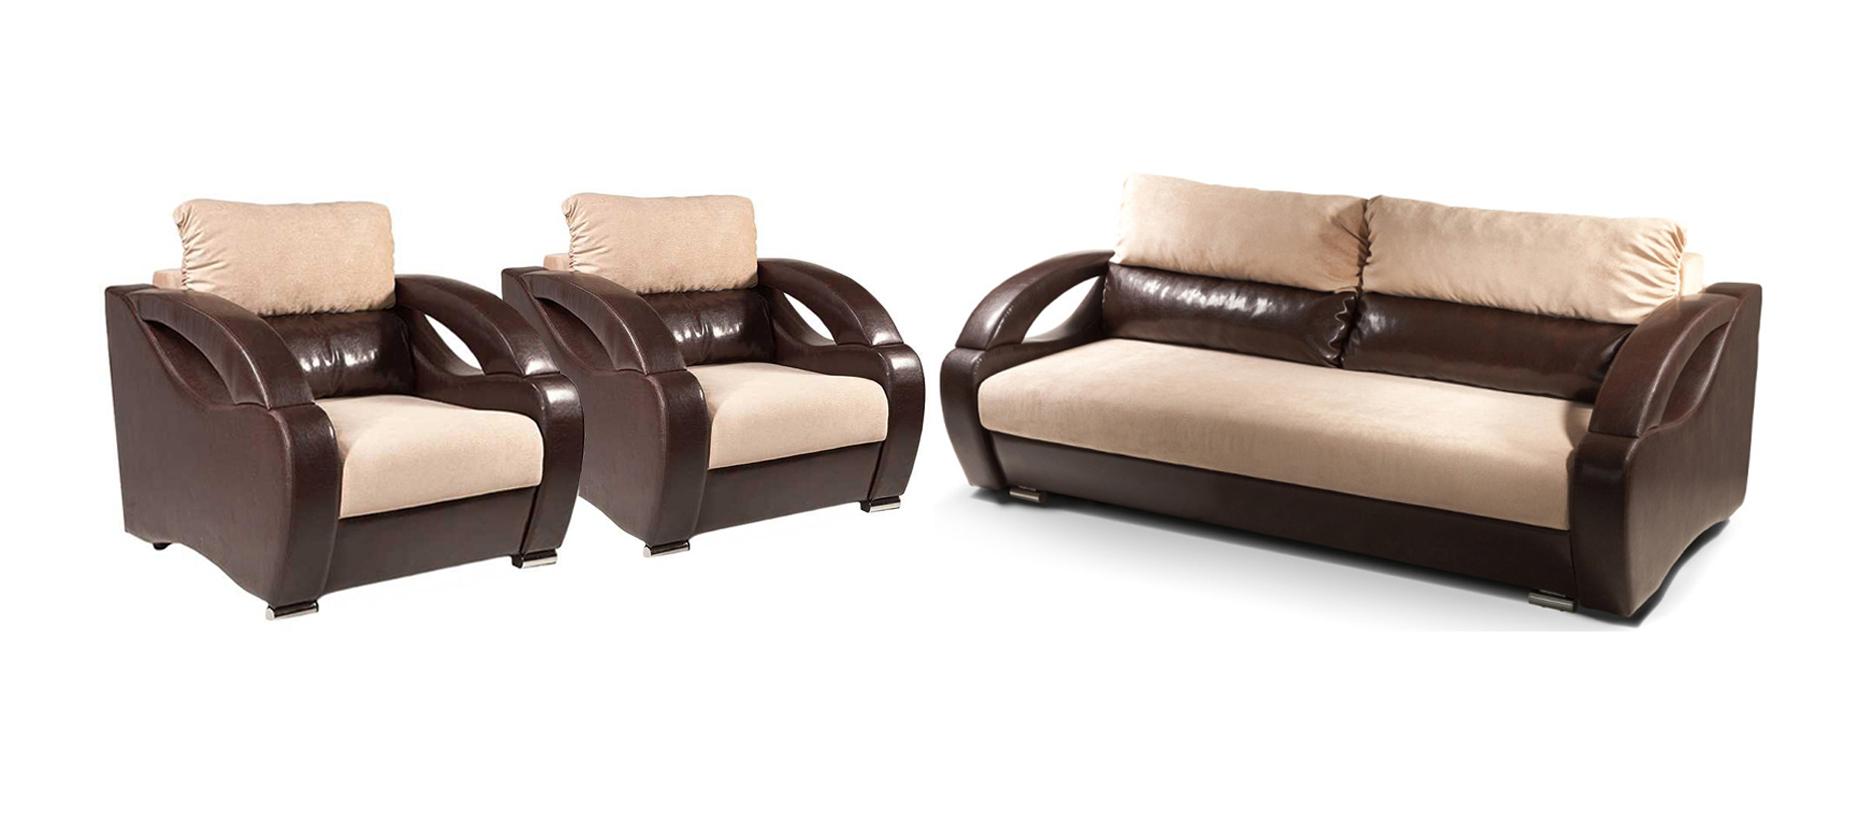 Комплект мягкой мебели Ласка